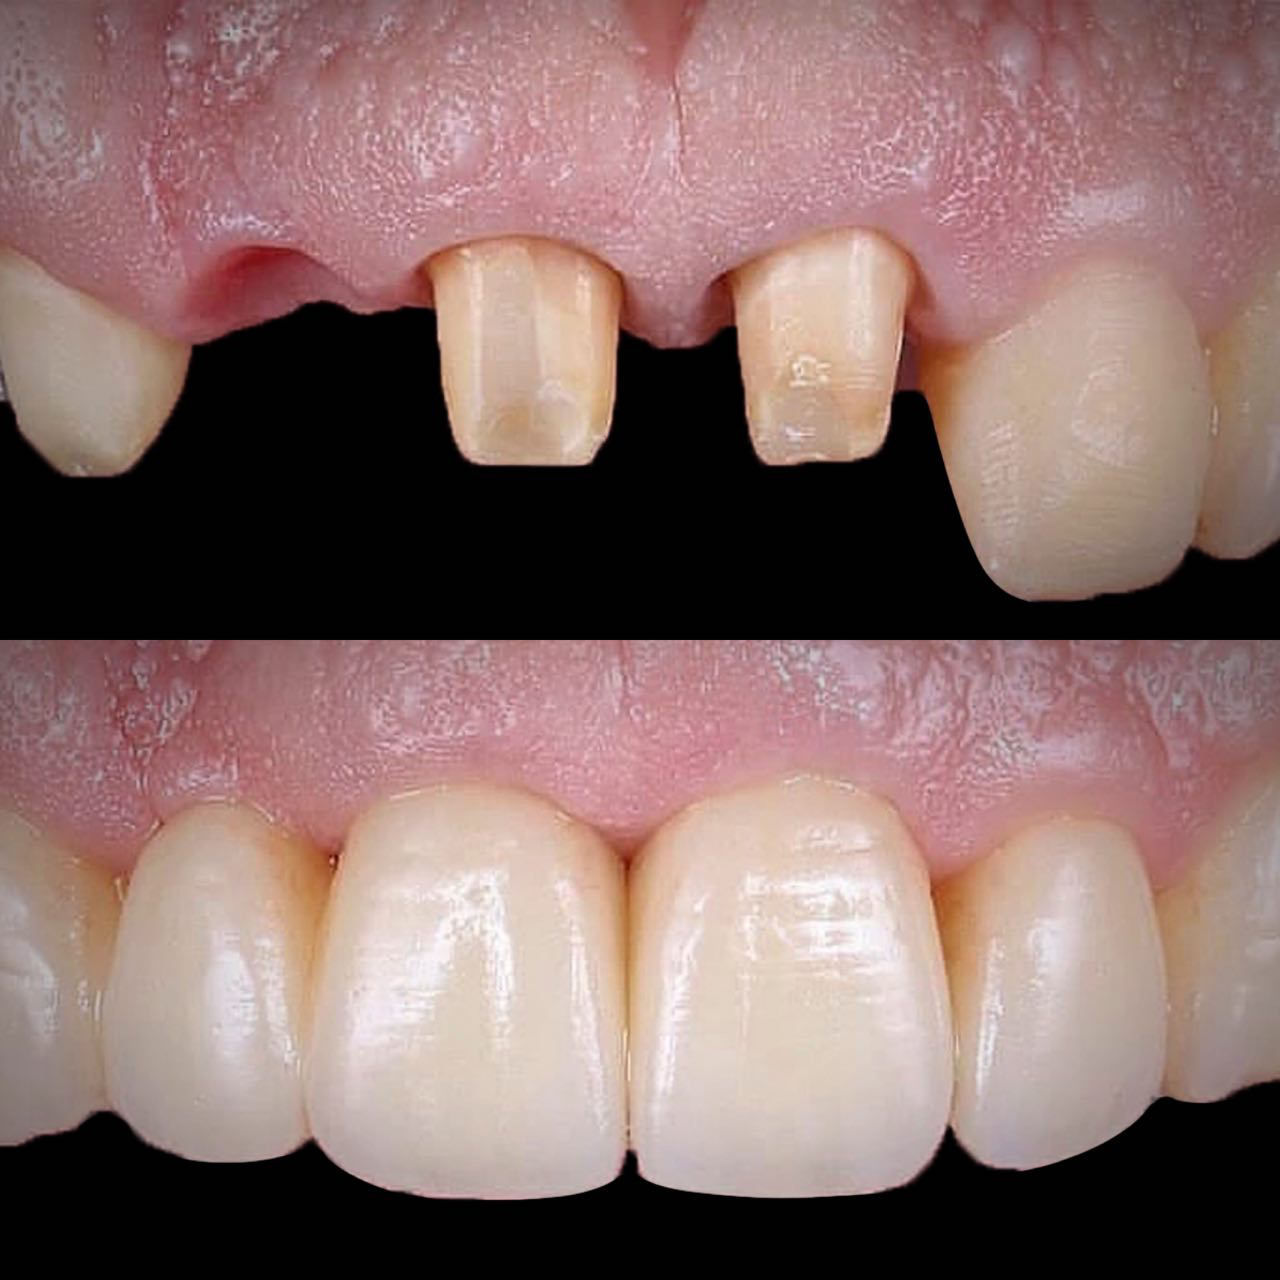 IMG 8A5DD7D7AB66 1 - Протезування зубів